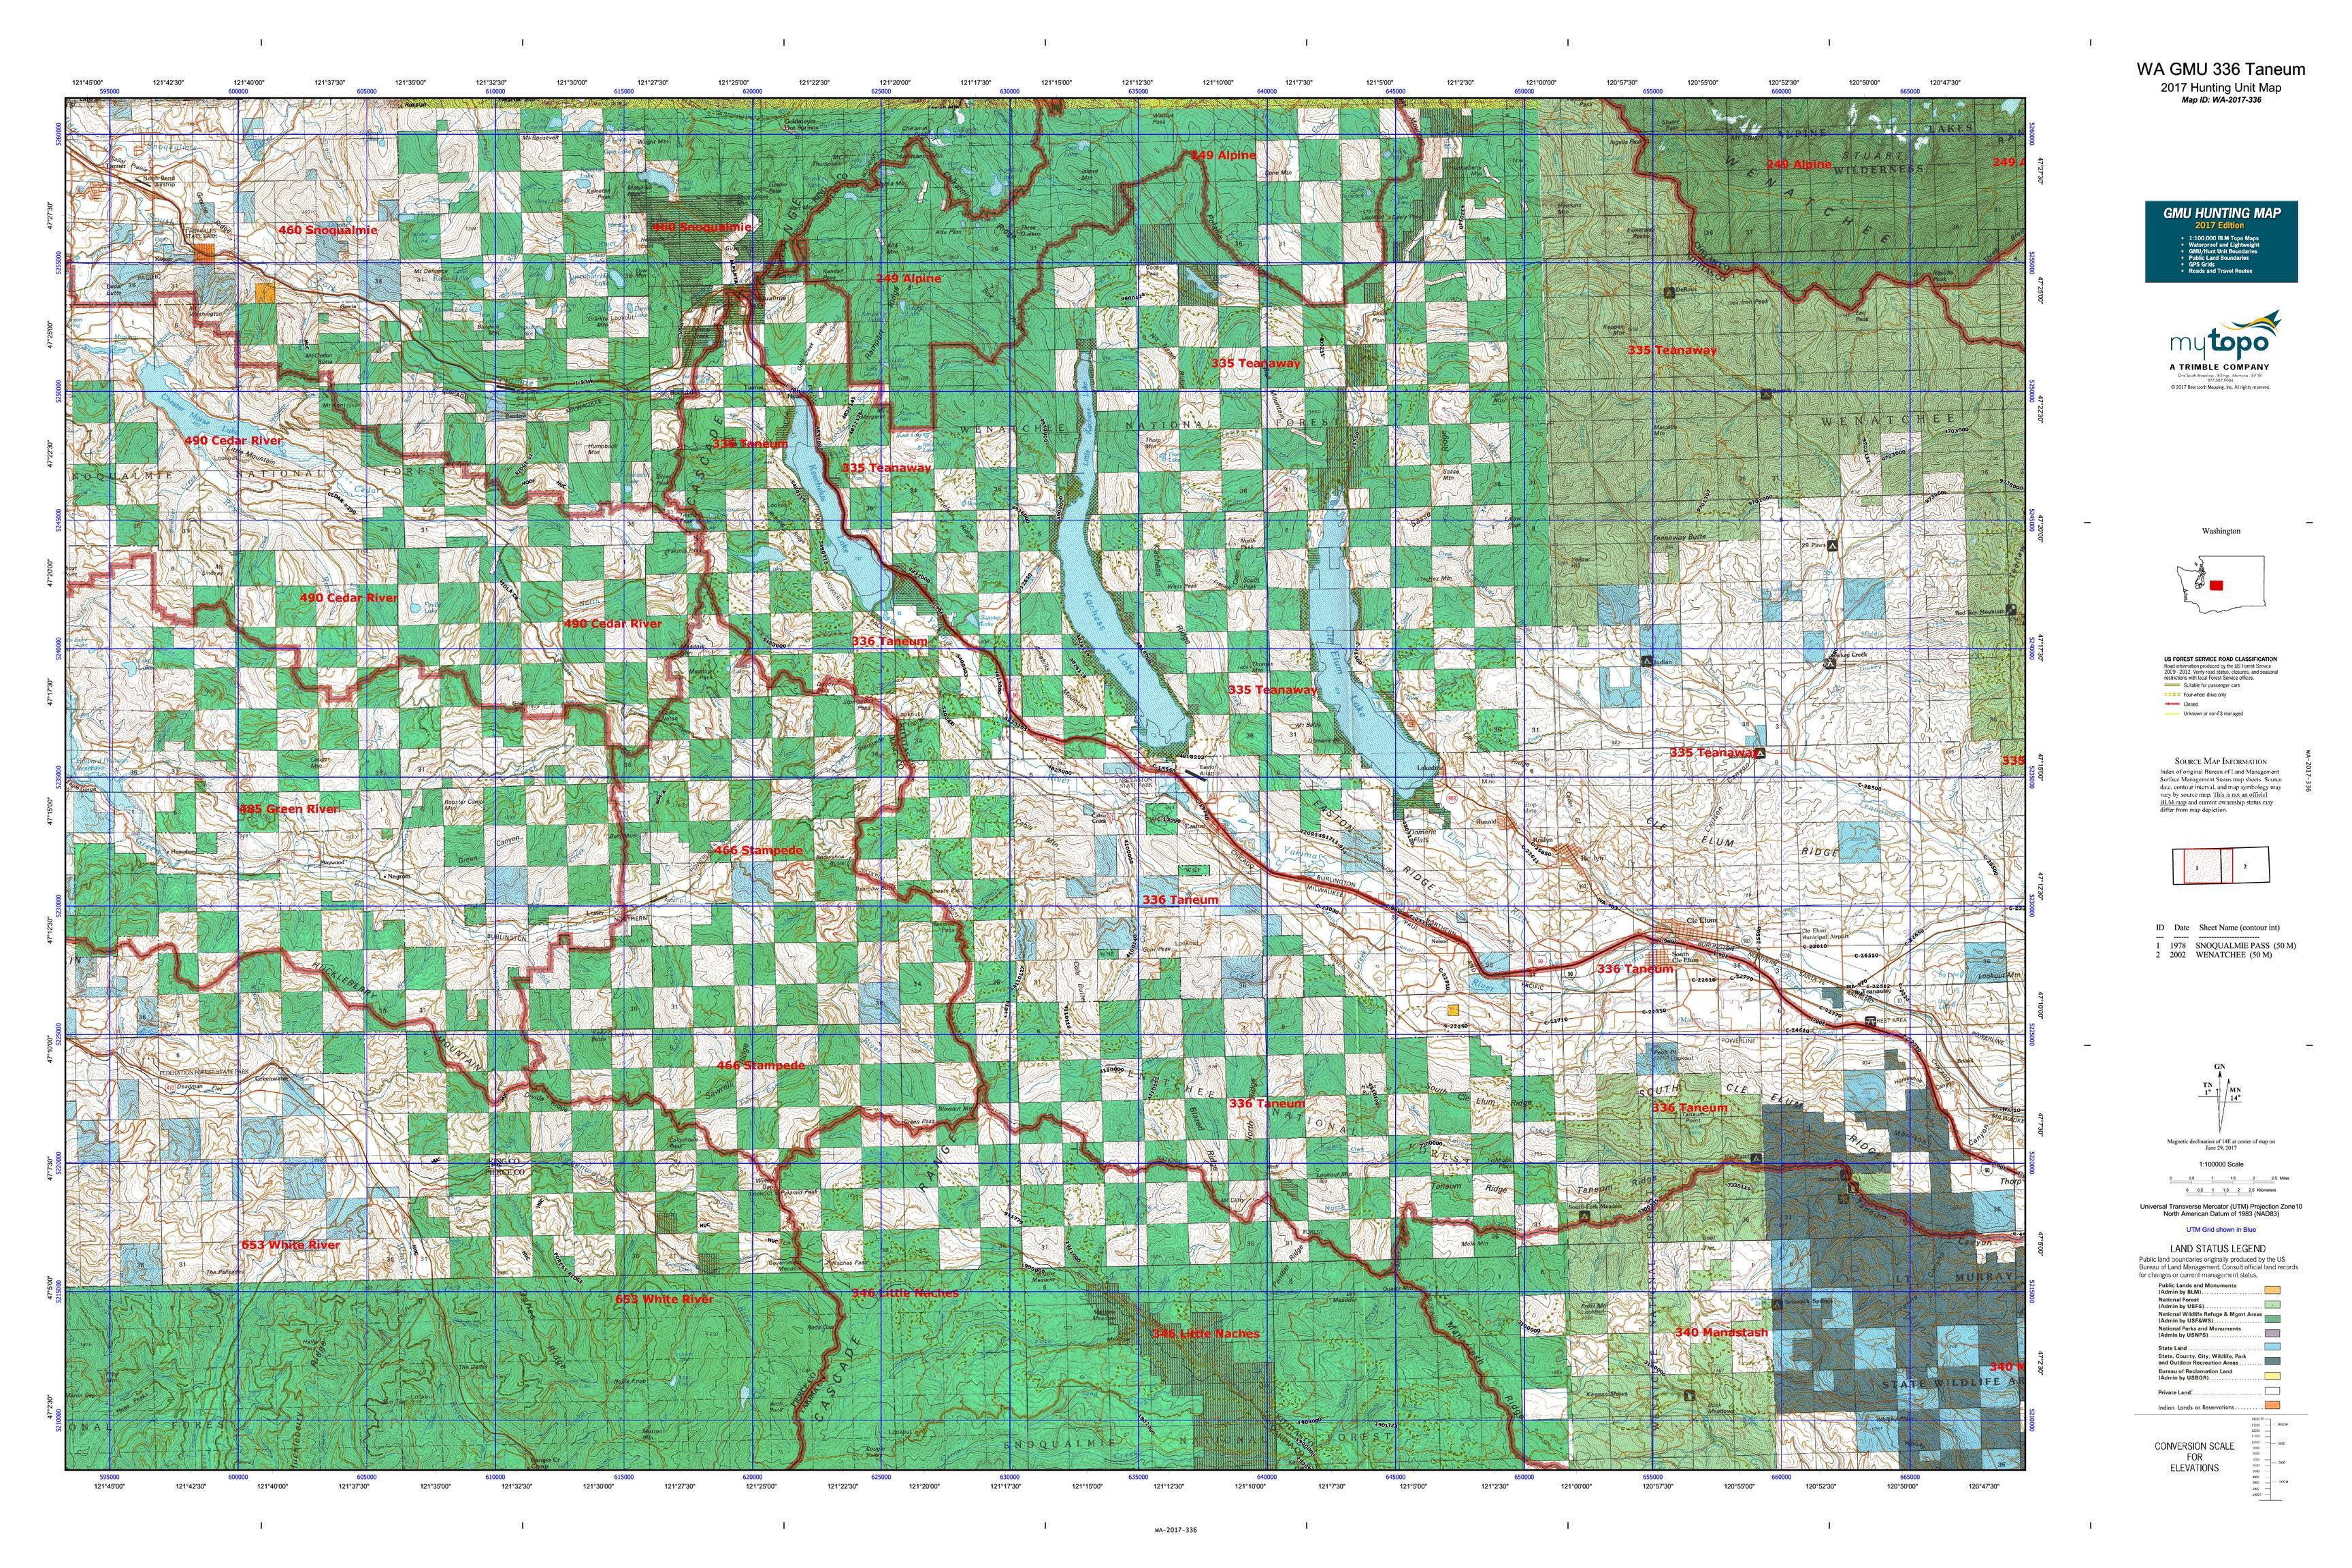 WA GMU Taneum Map MyTopo - Detailed map of washington state